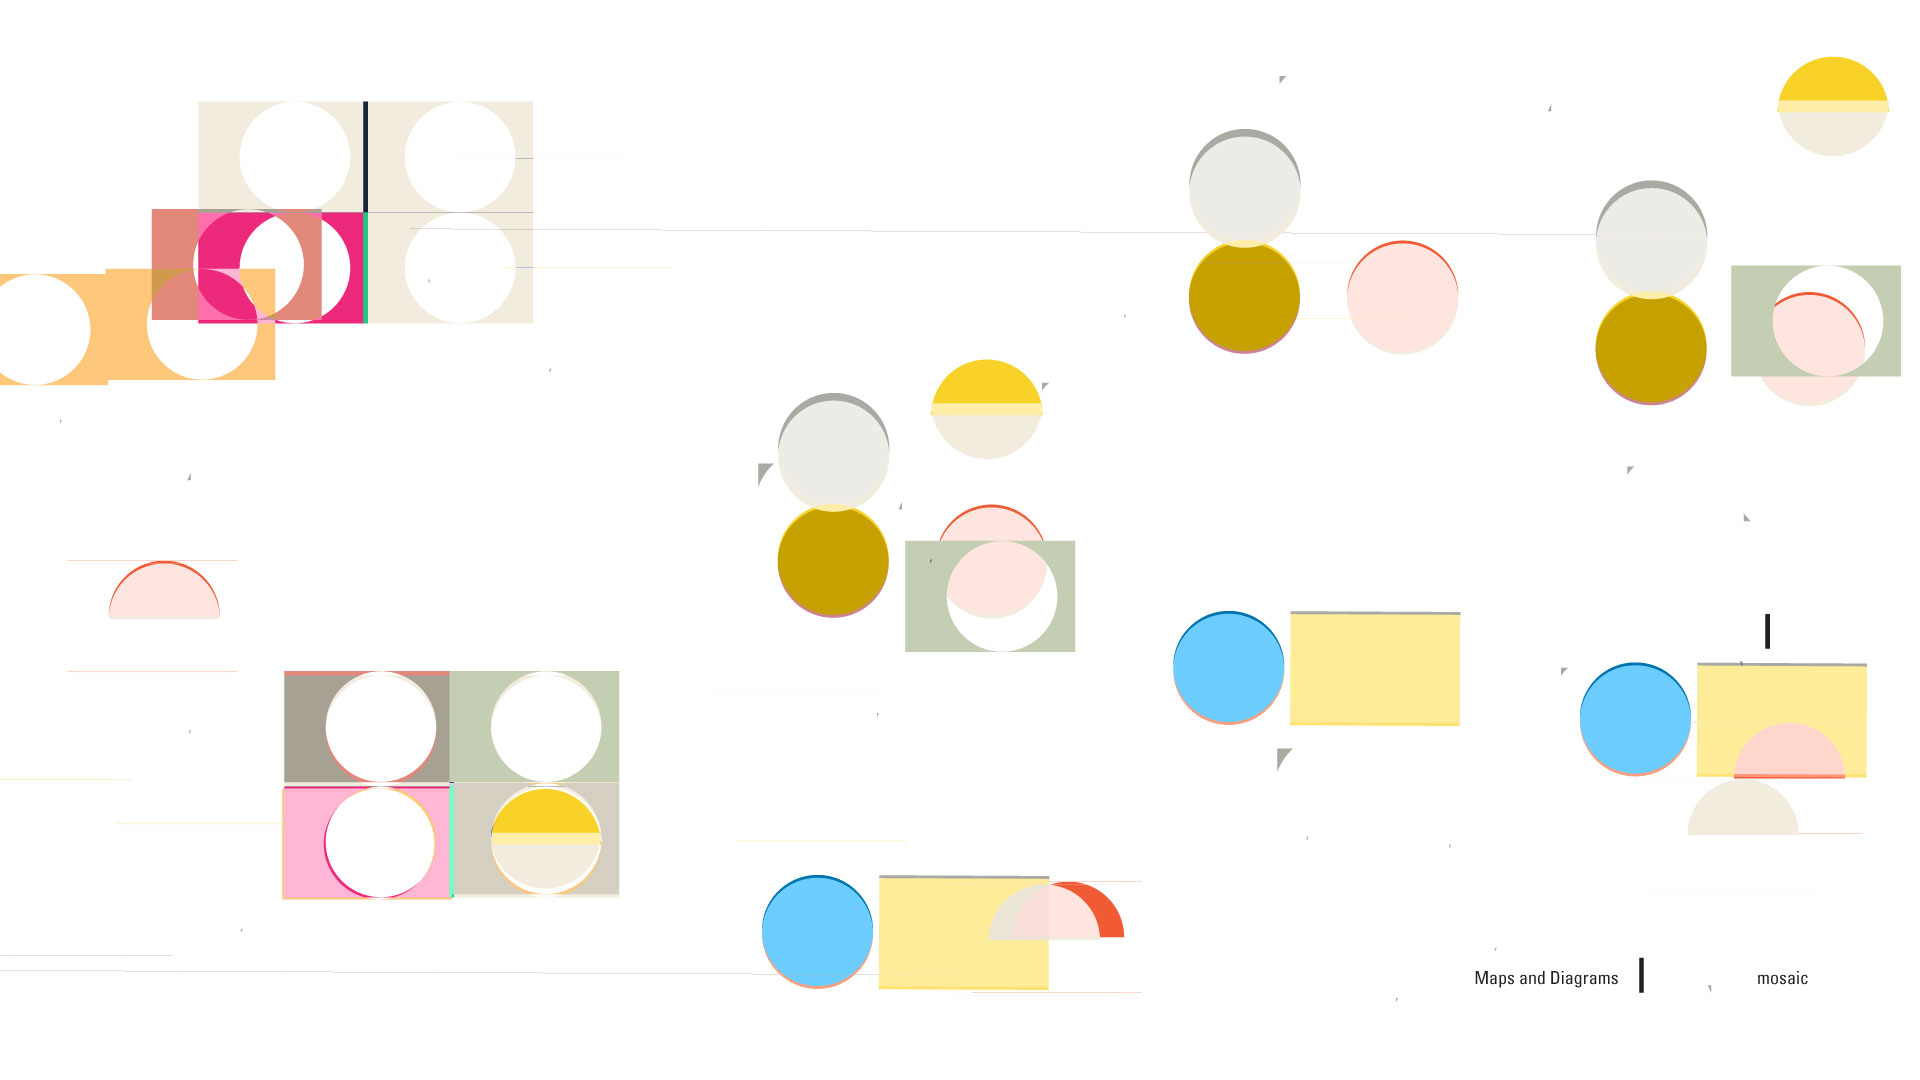 Maps and Diagrams – Mosaic